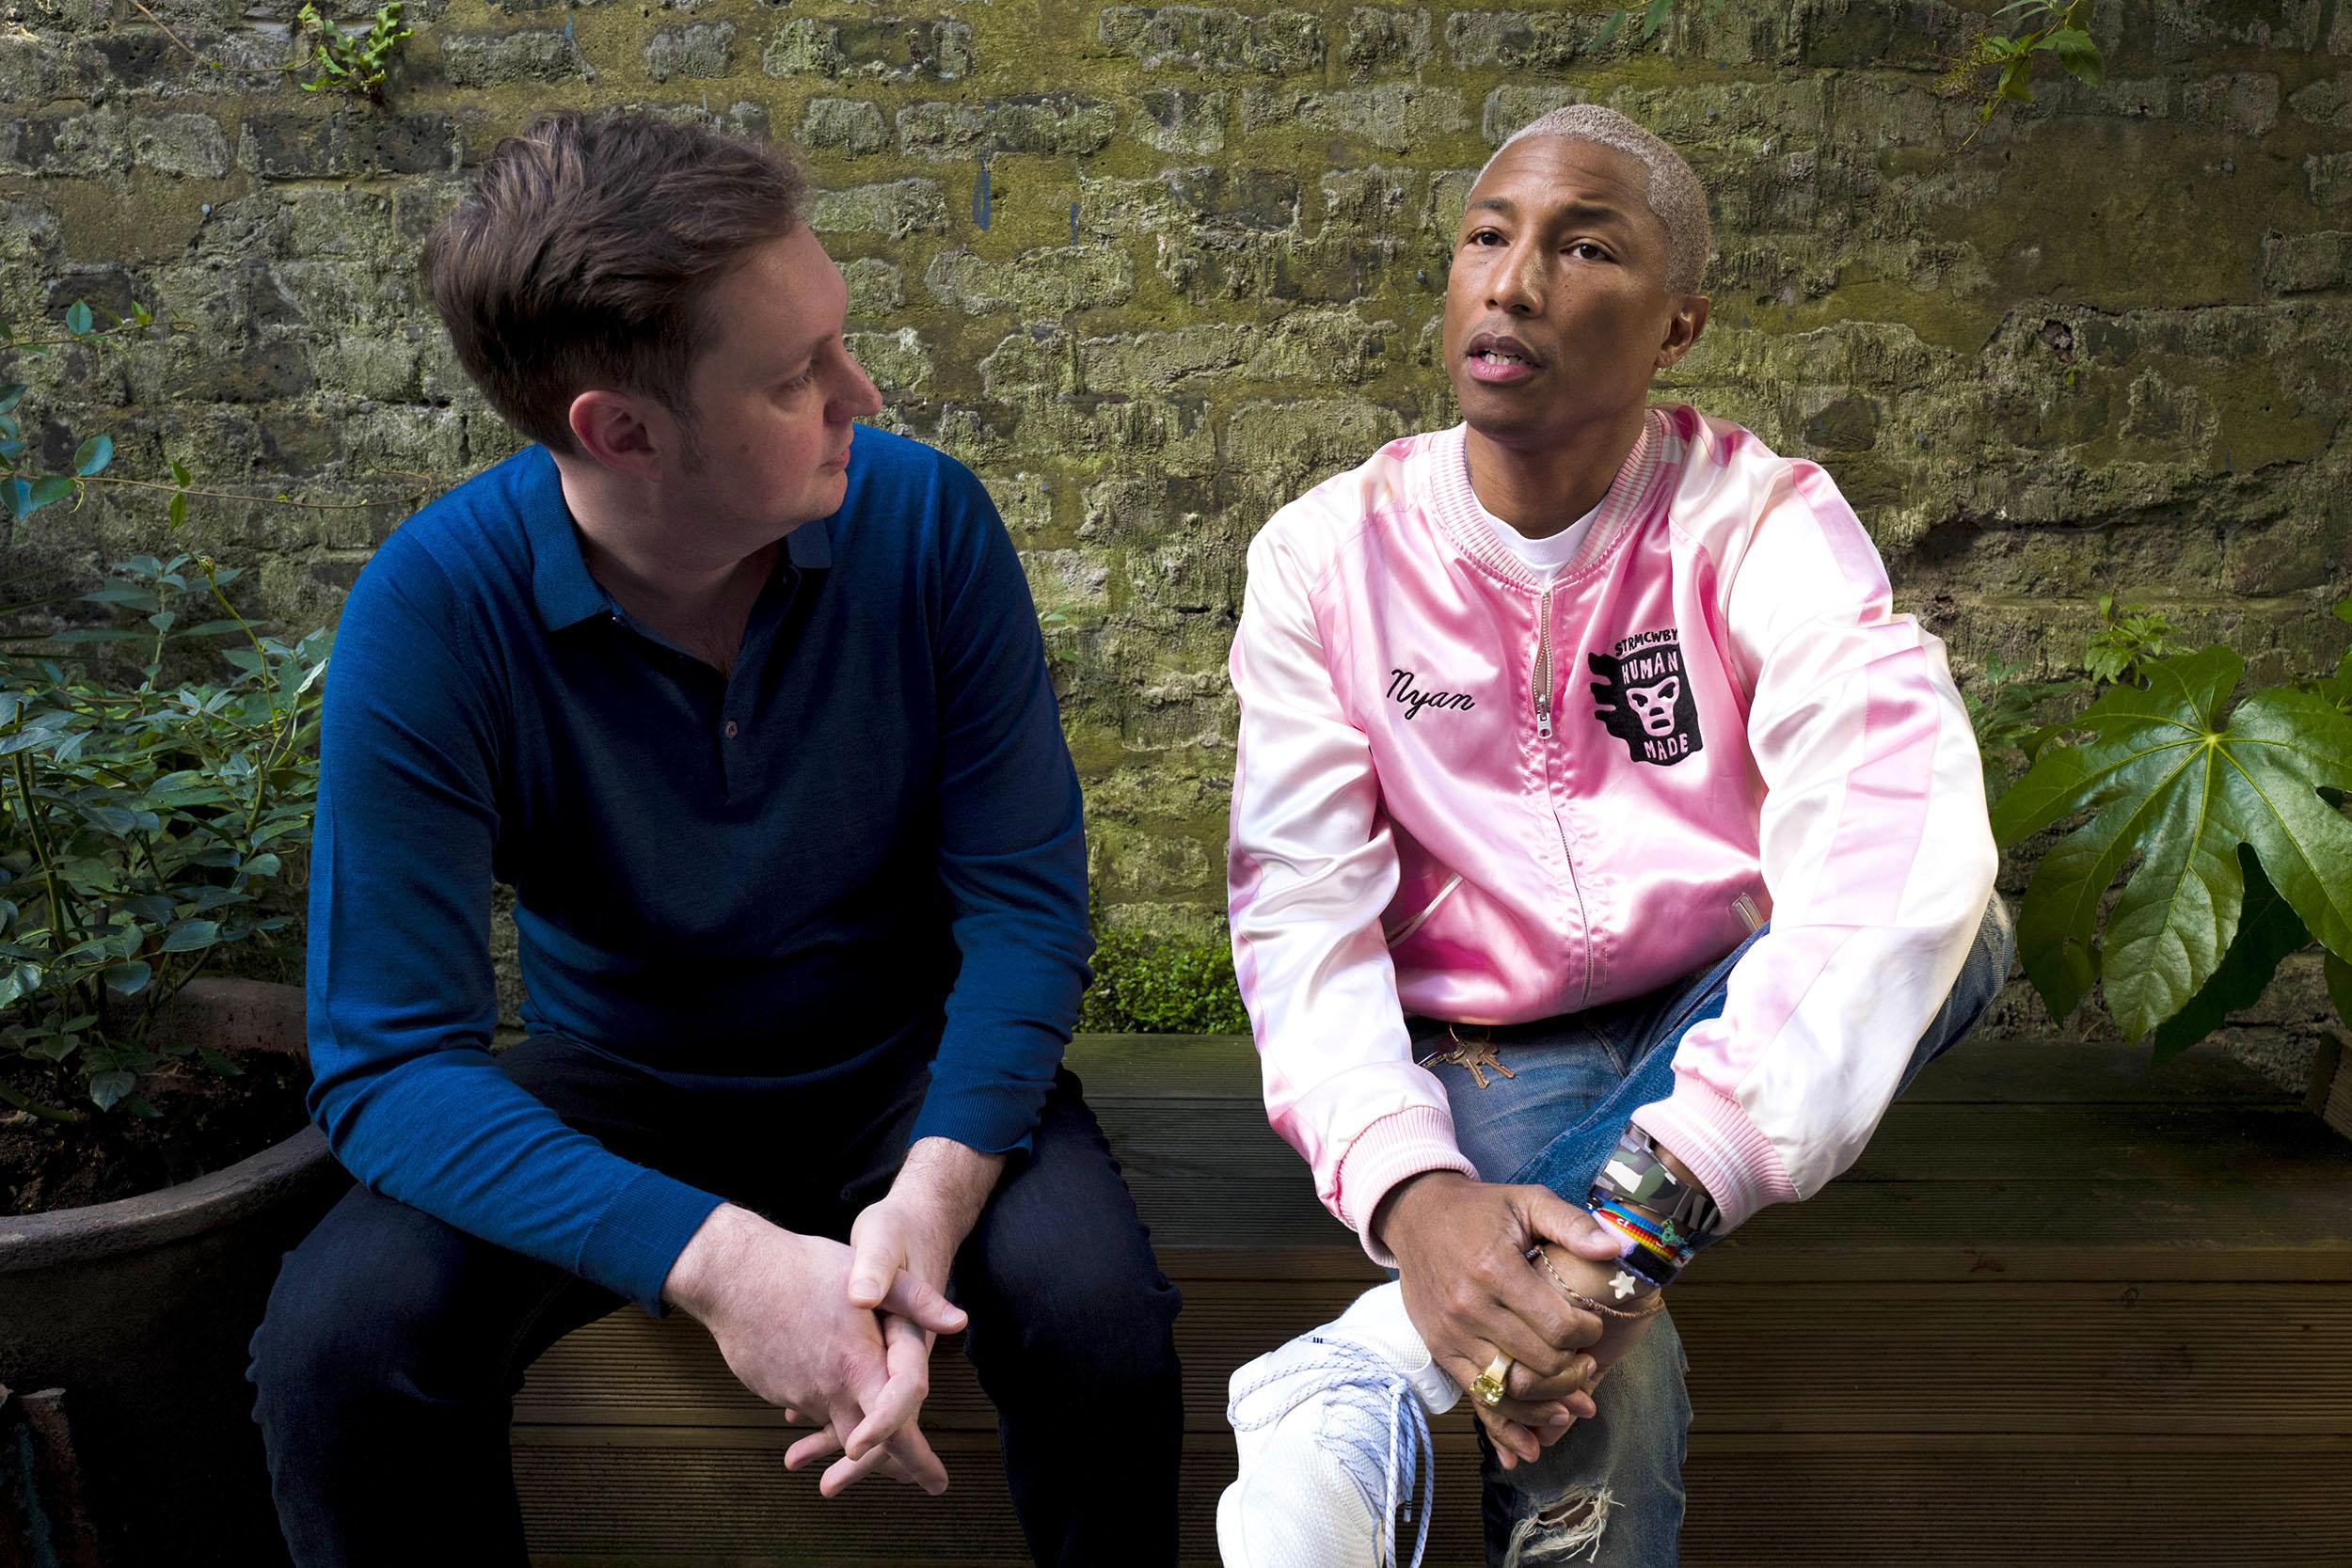 Pharrell CCO image